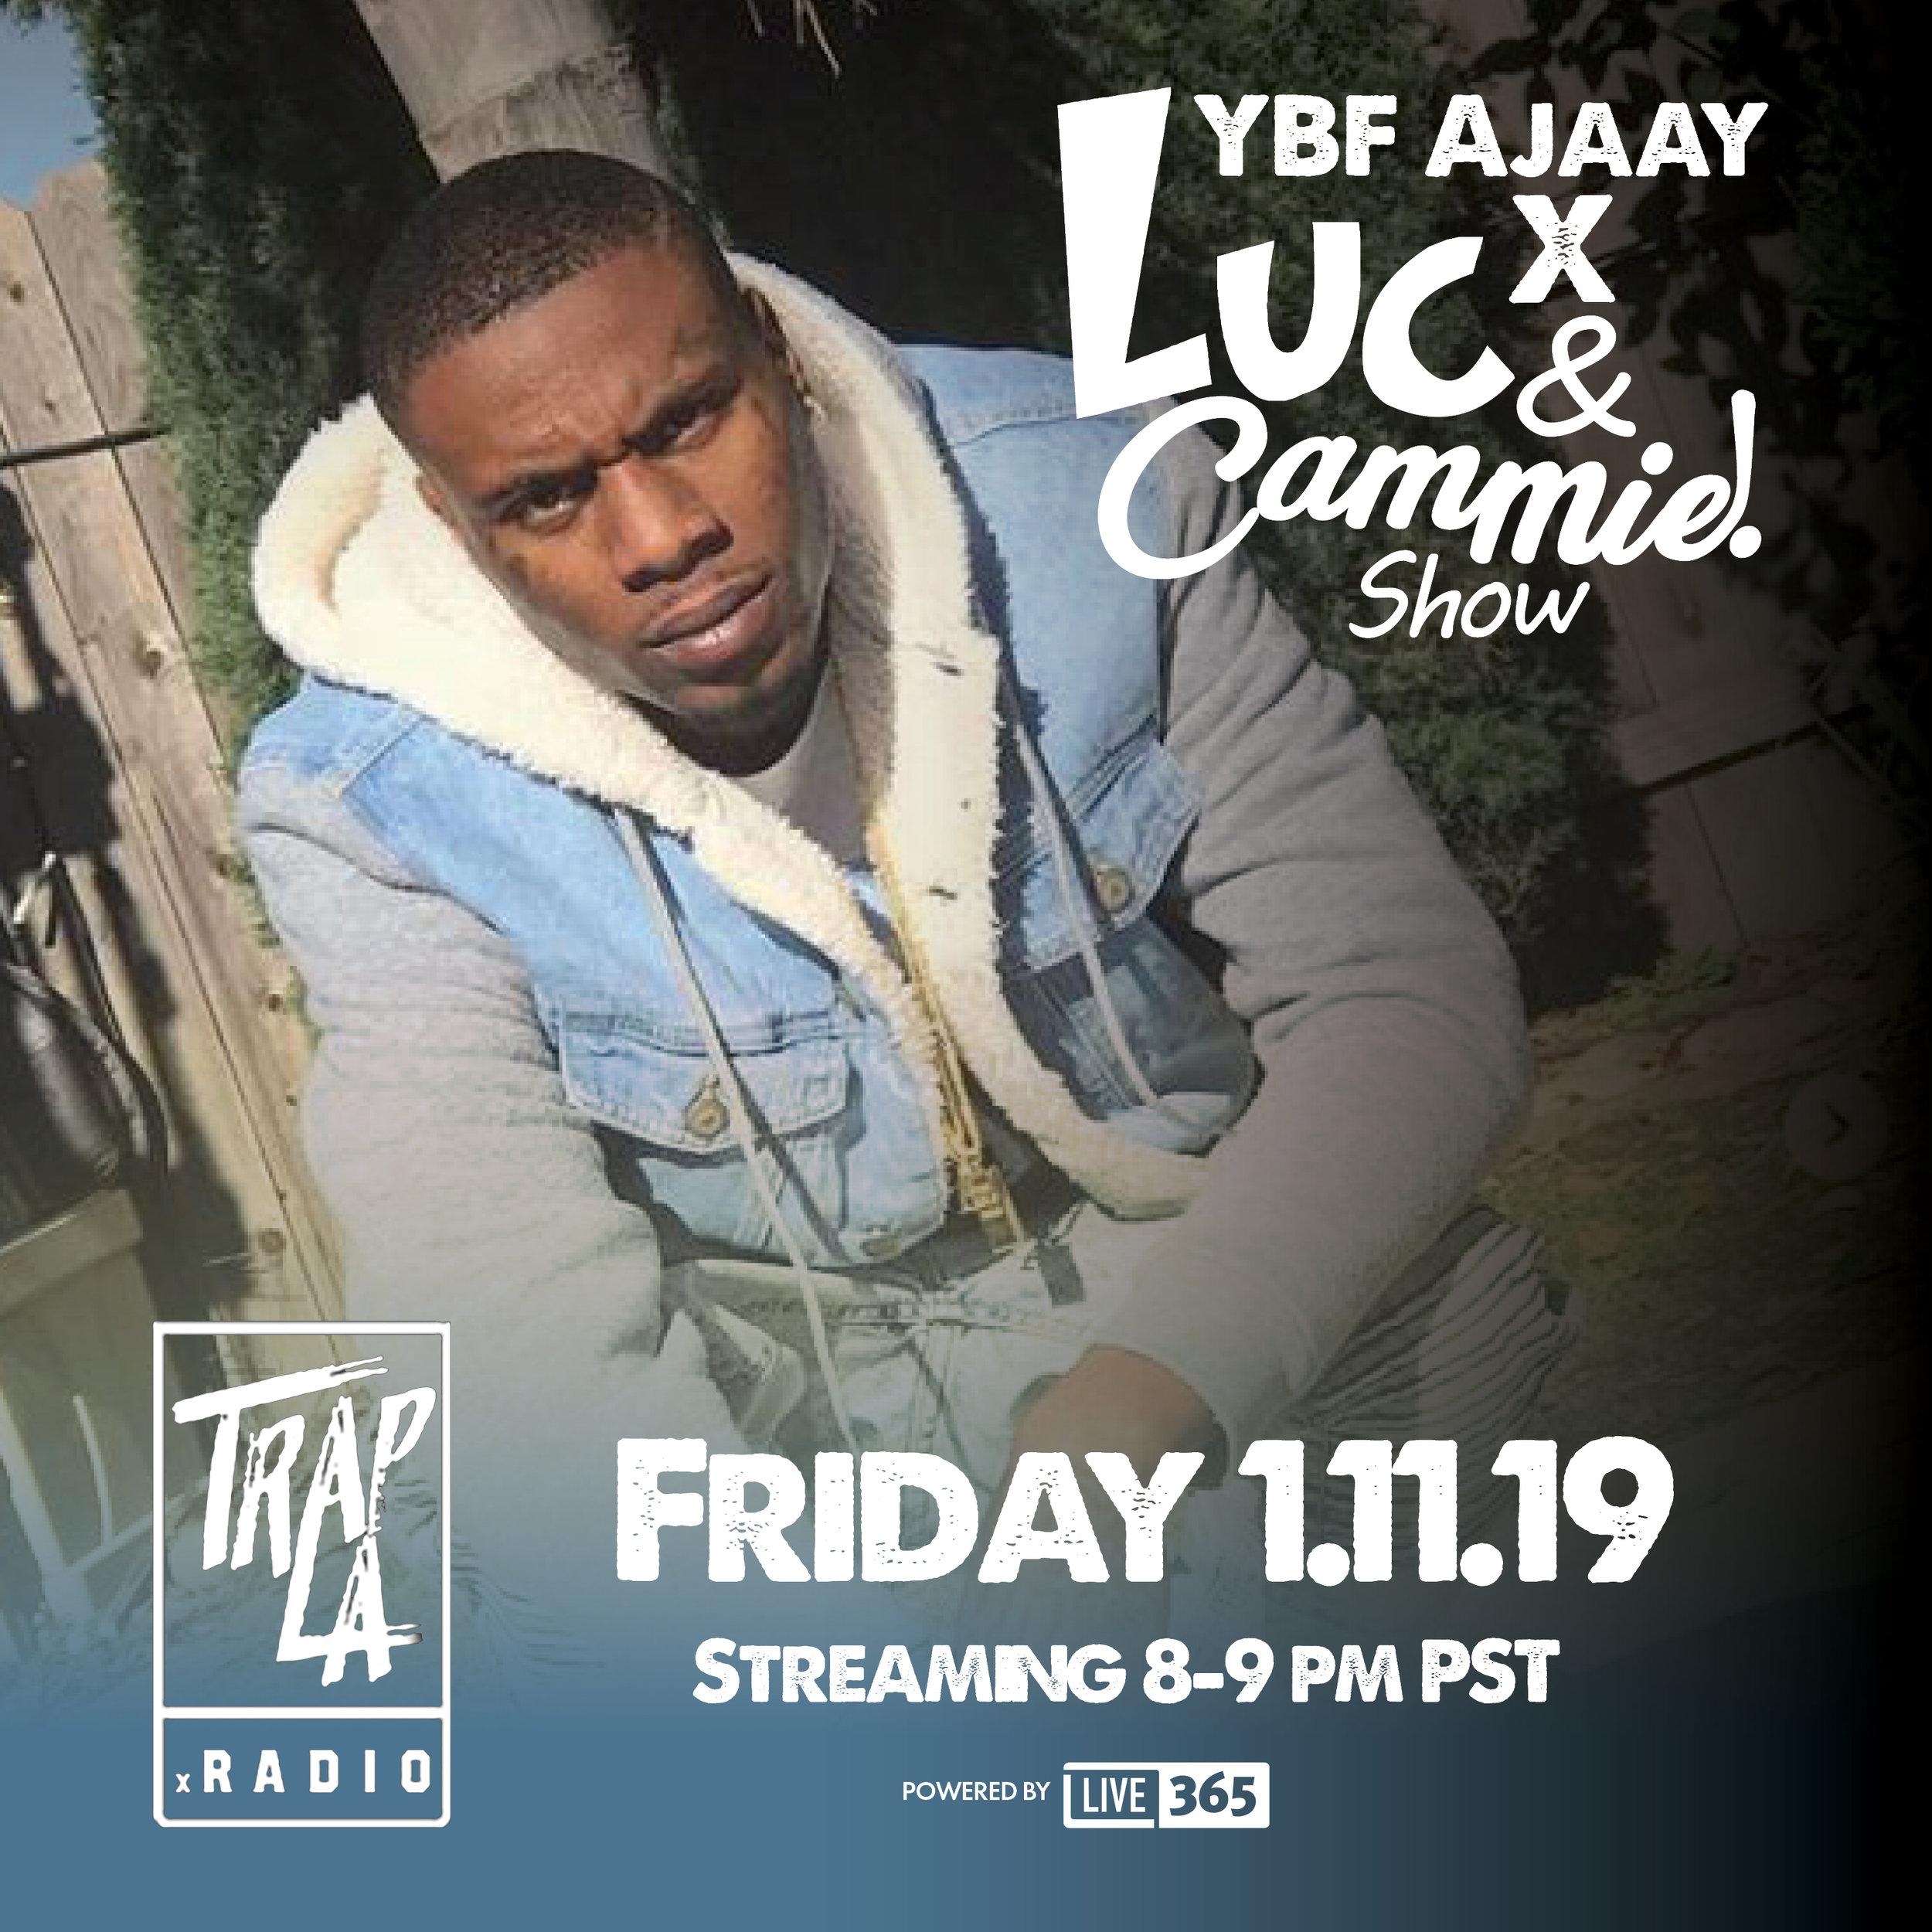 YBF AJaay promo_1.11.19_Trap.LA.jpg